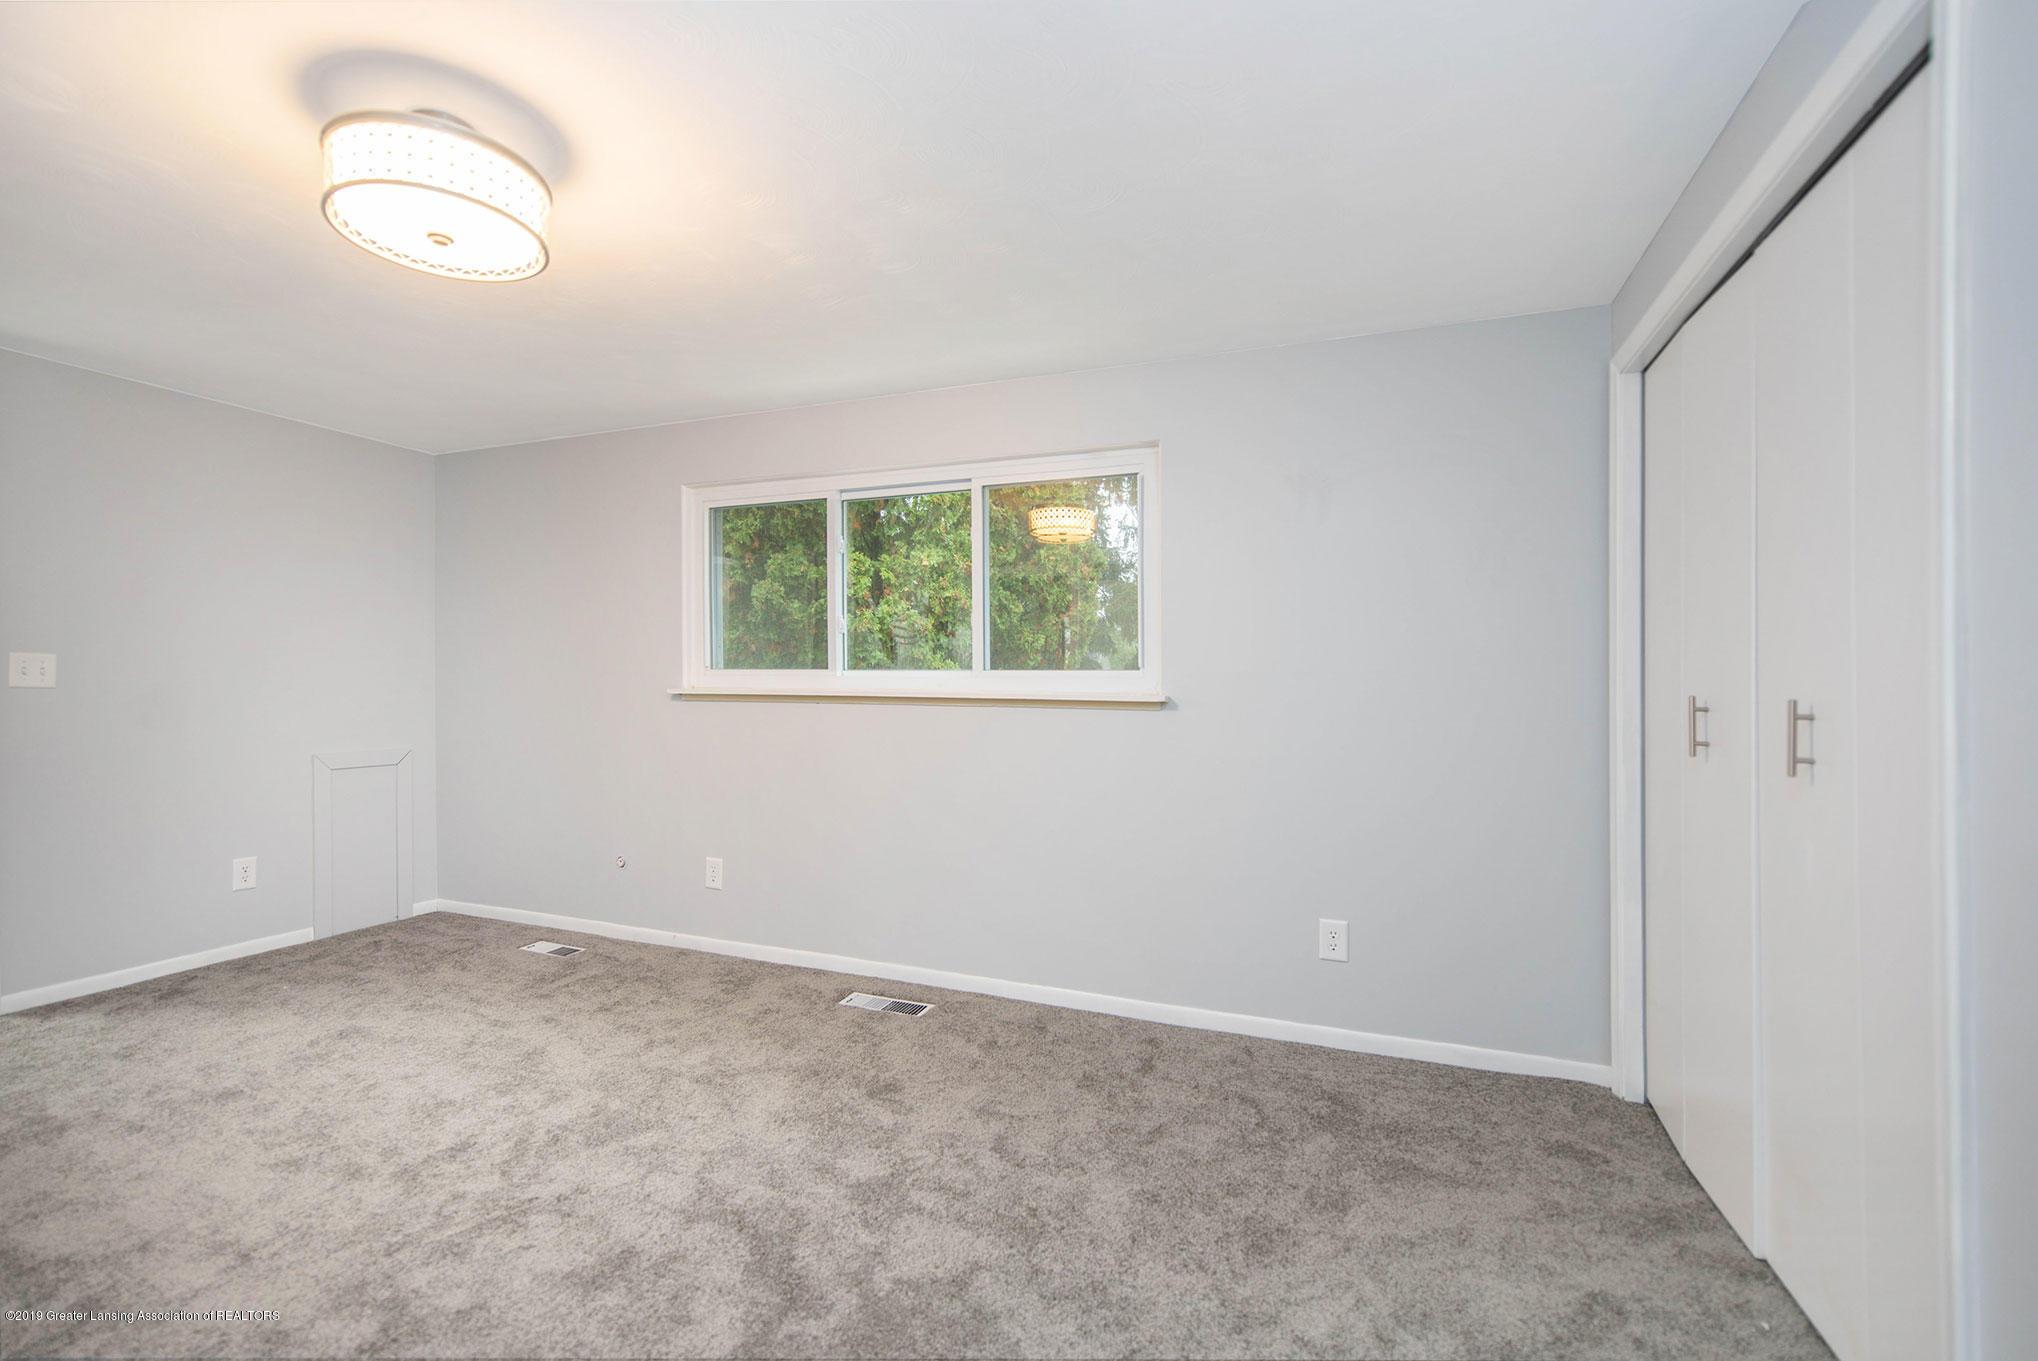 801 Merrill Ave - Bedroom - 10